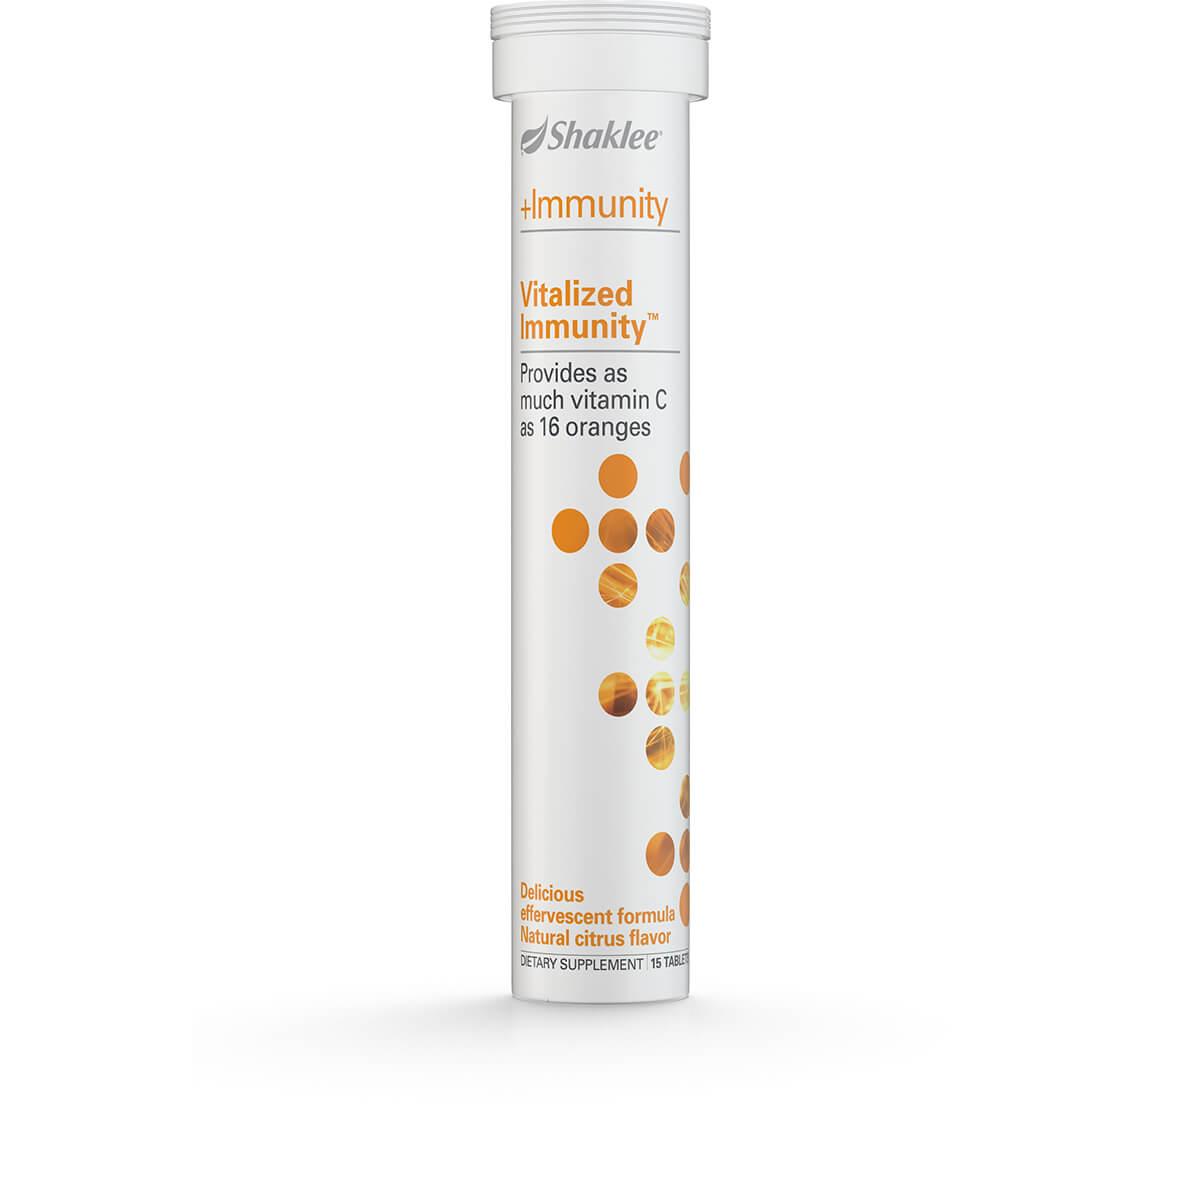 Shaklee Vitalized Immunity